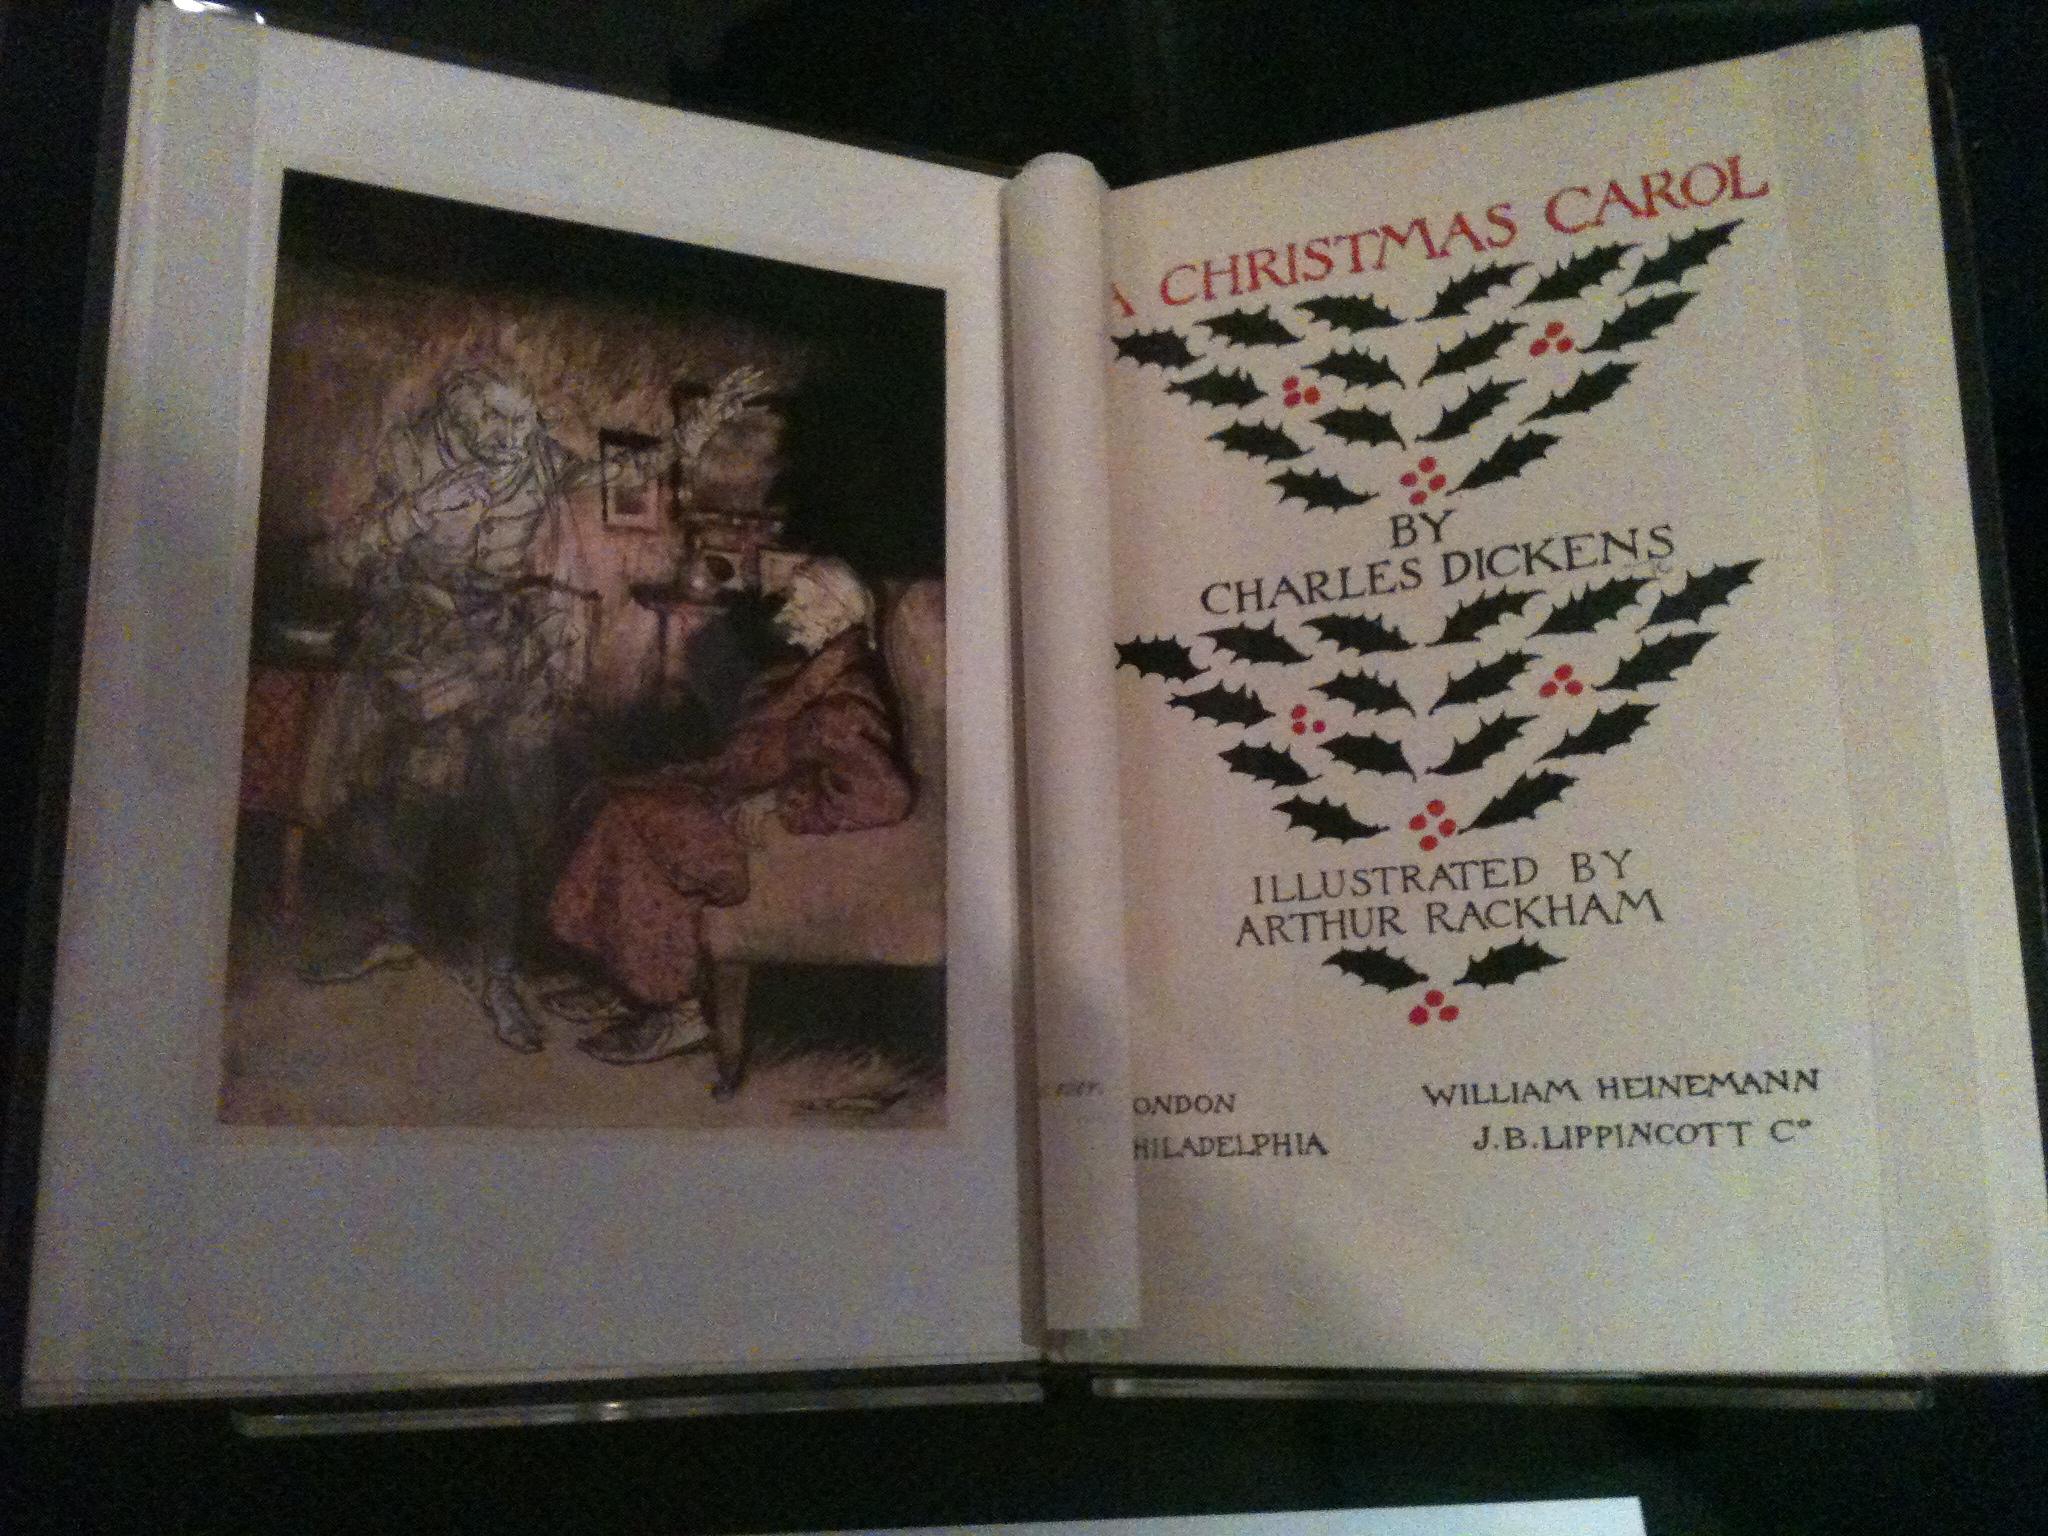 A Christmas Carol, illustrated by Arthur Rackham